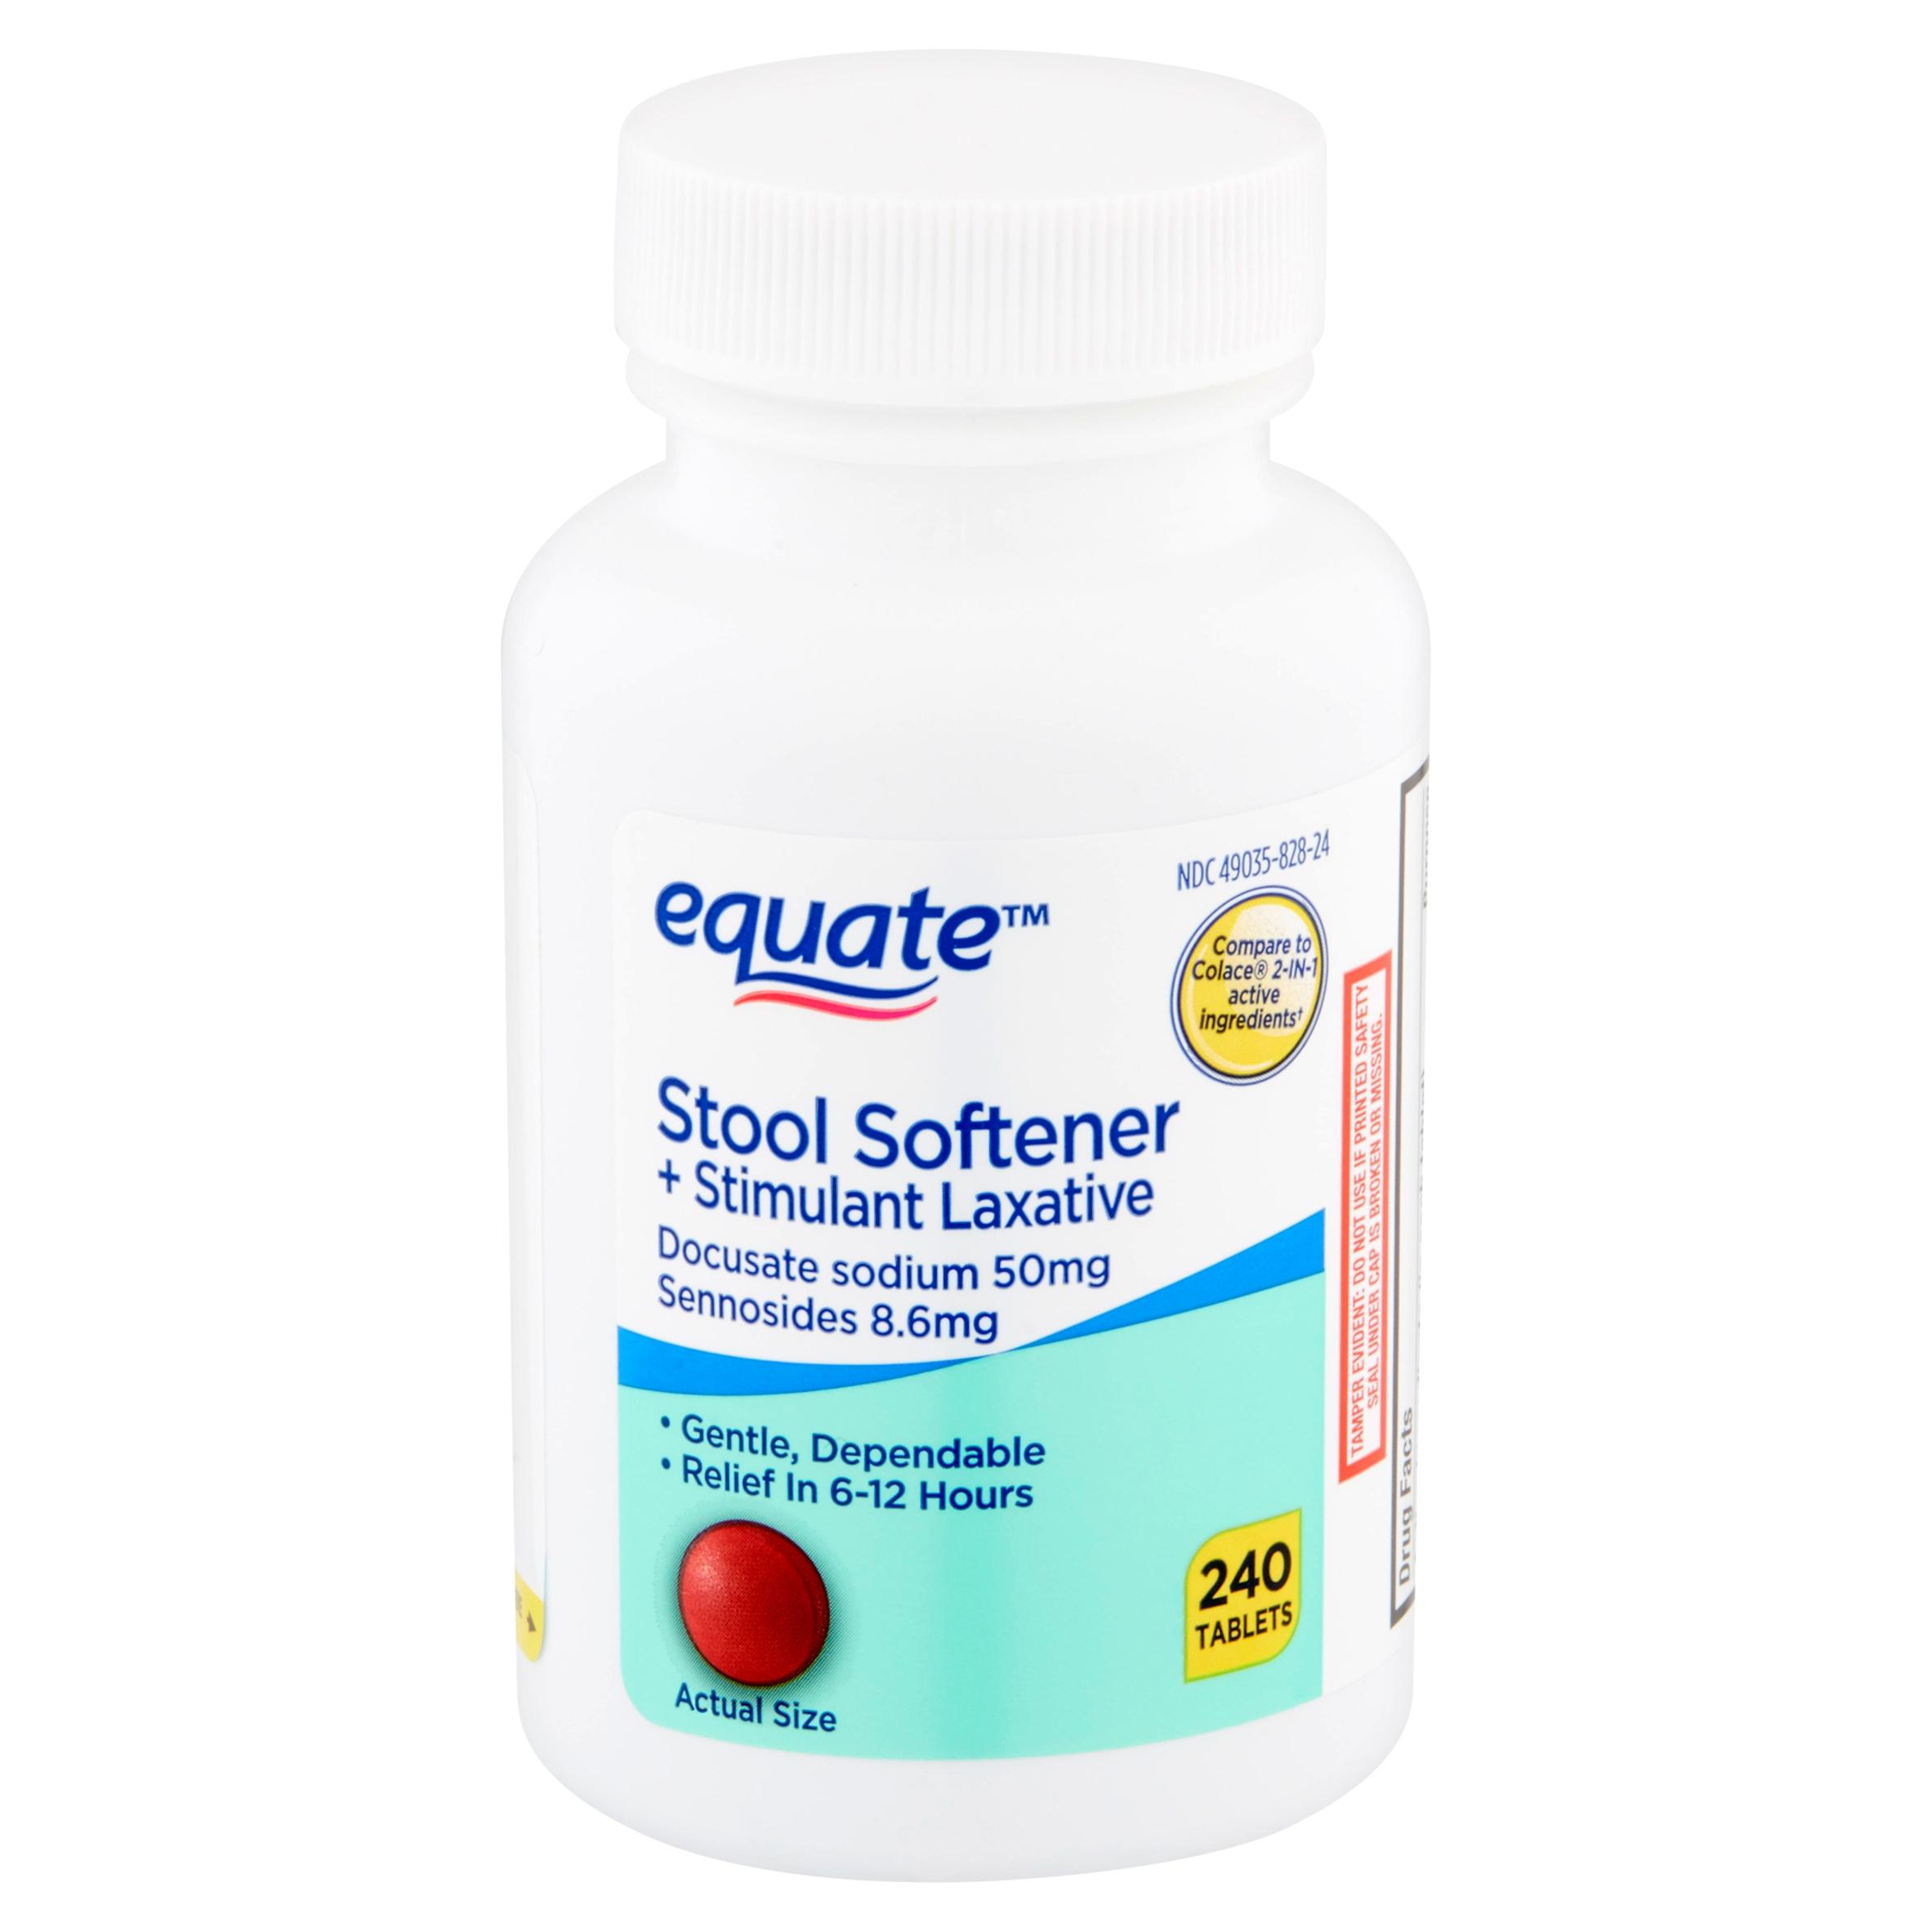 Equate Stool Softener Plus Stimulant Laxative 240 Tablets ...